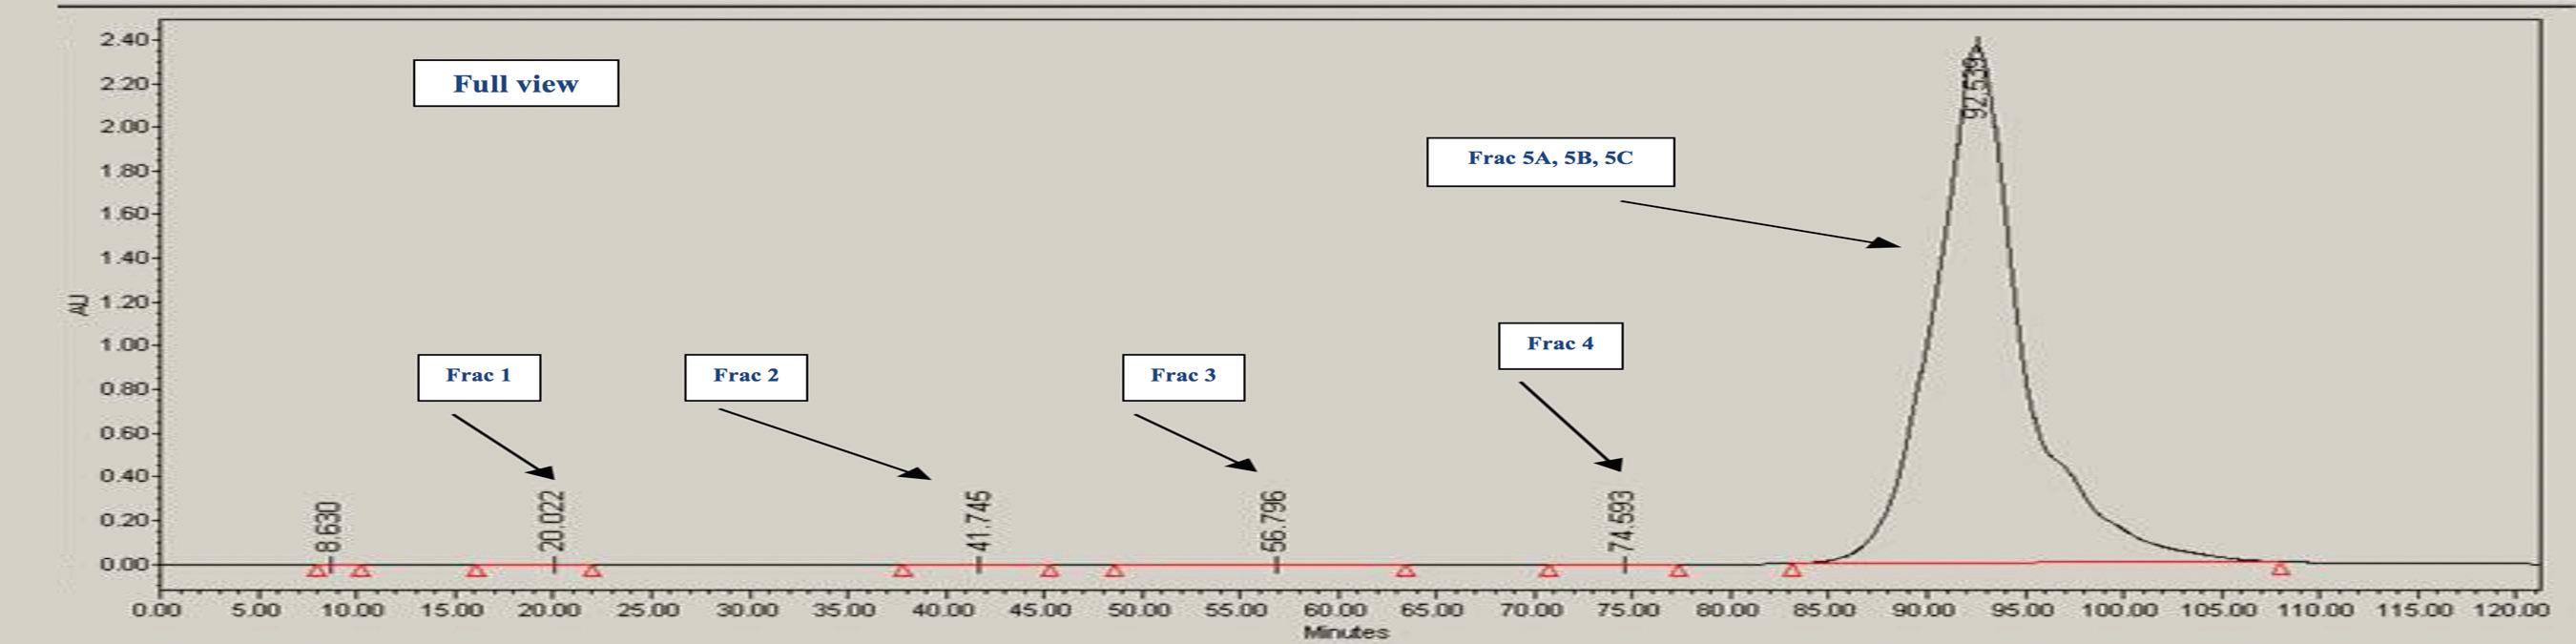 Figure 1. Representative IEX Chromatogram of Sample (Full View)